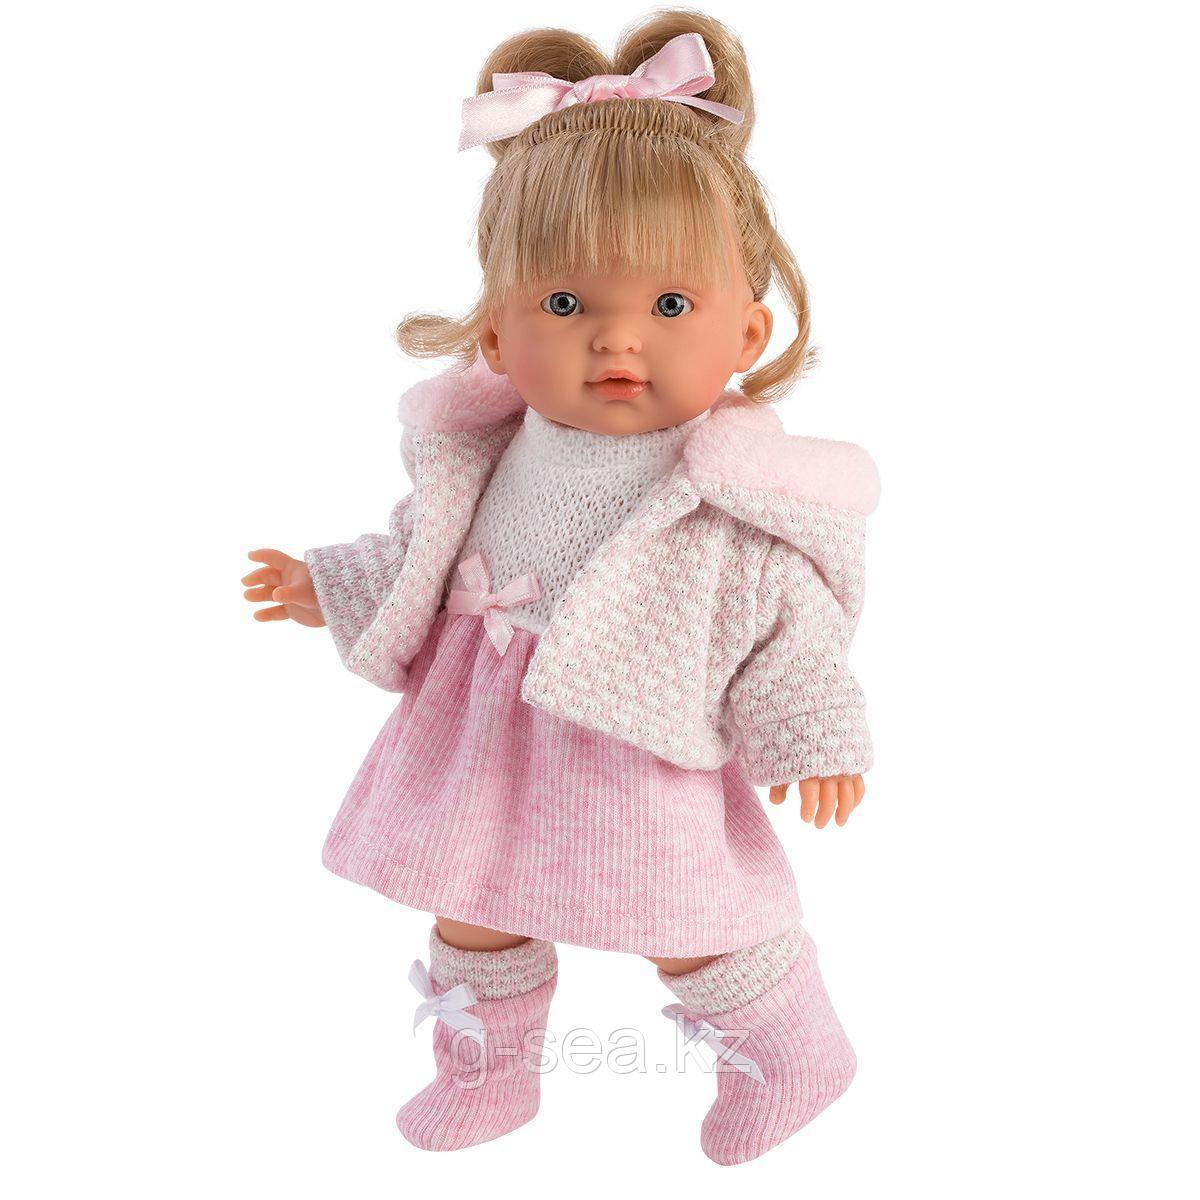 LLORENS: Кукла Валерия 28 см., блондинка в розовом костюме - фото 1